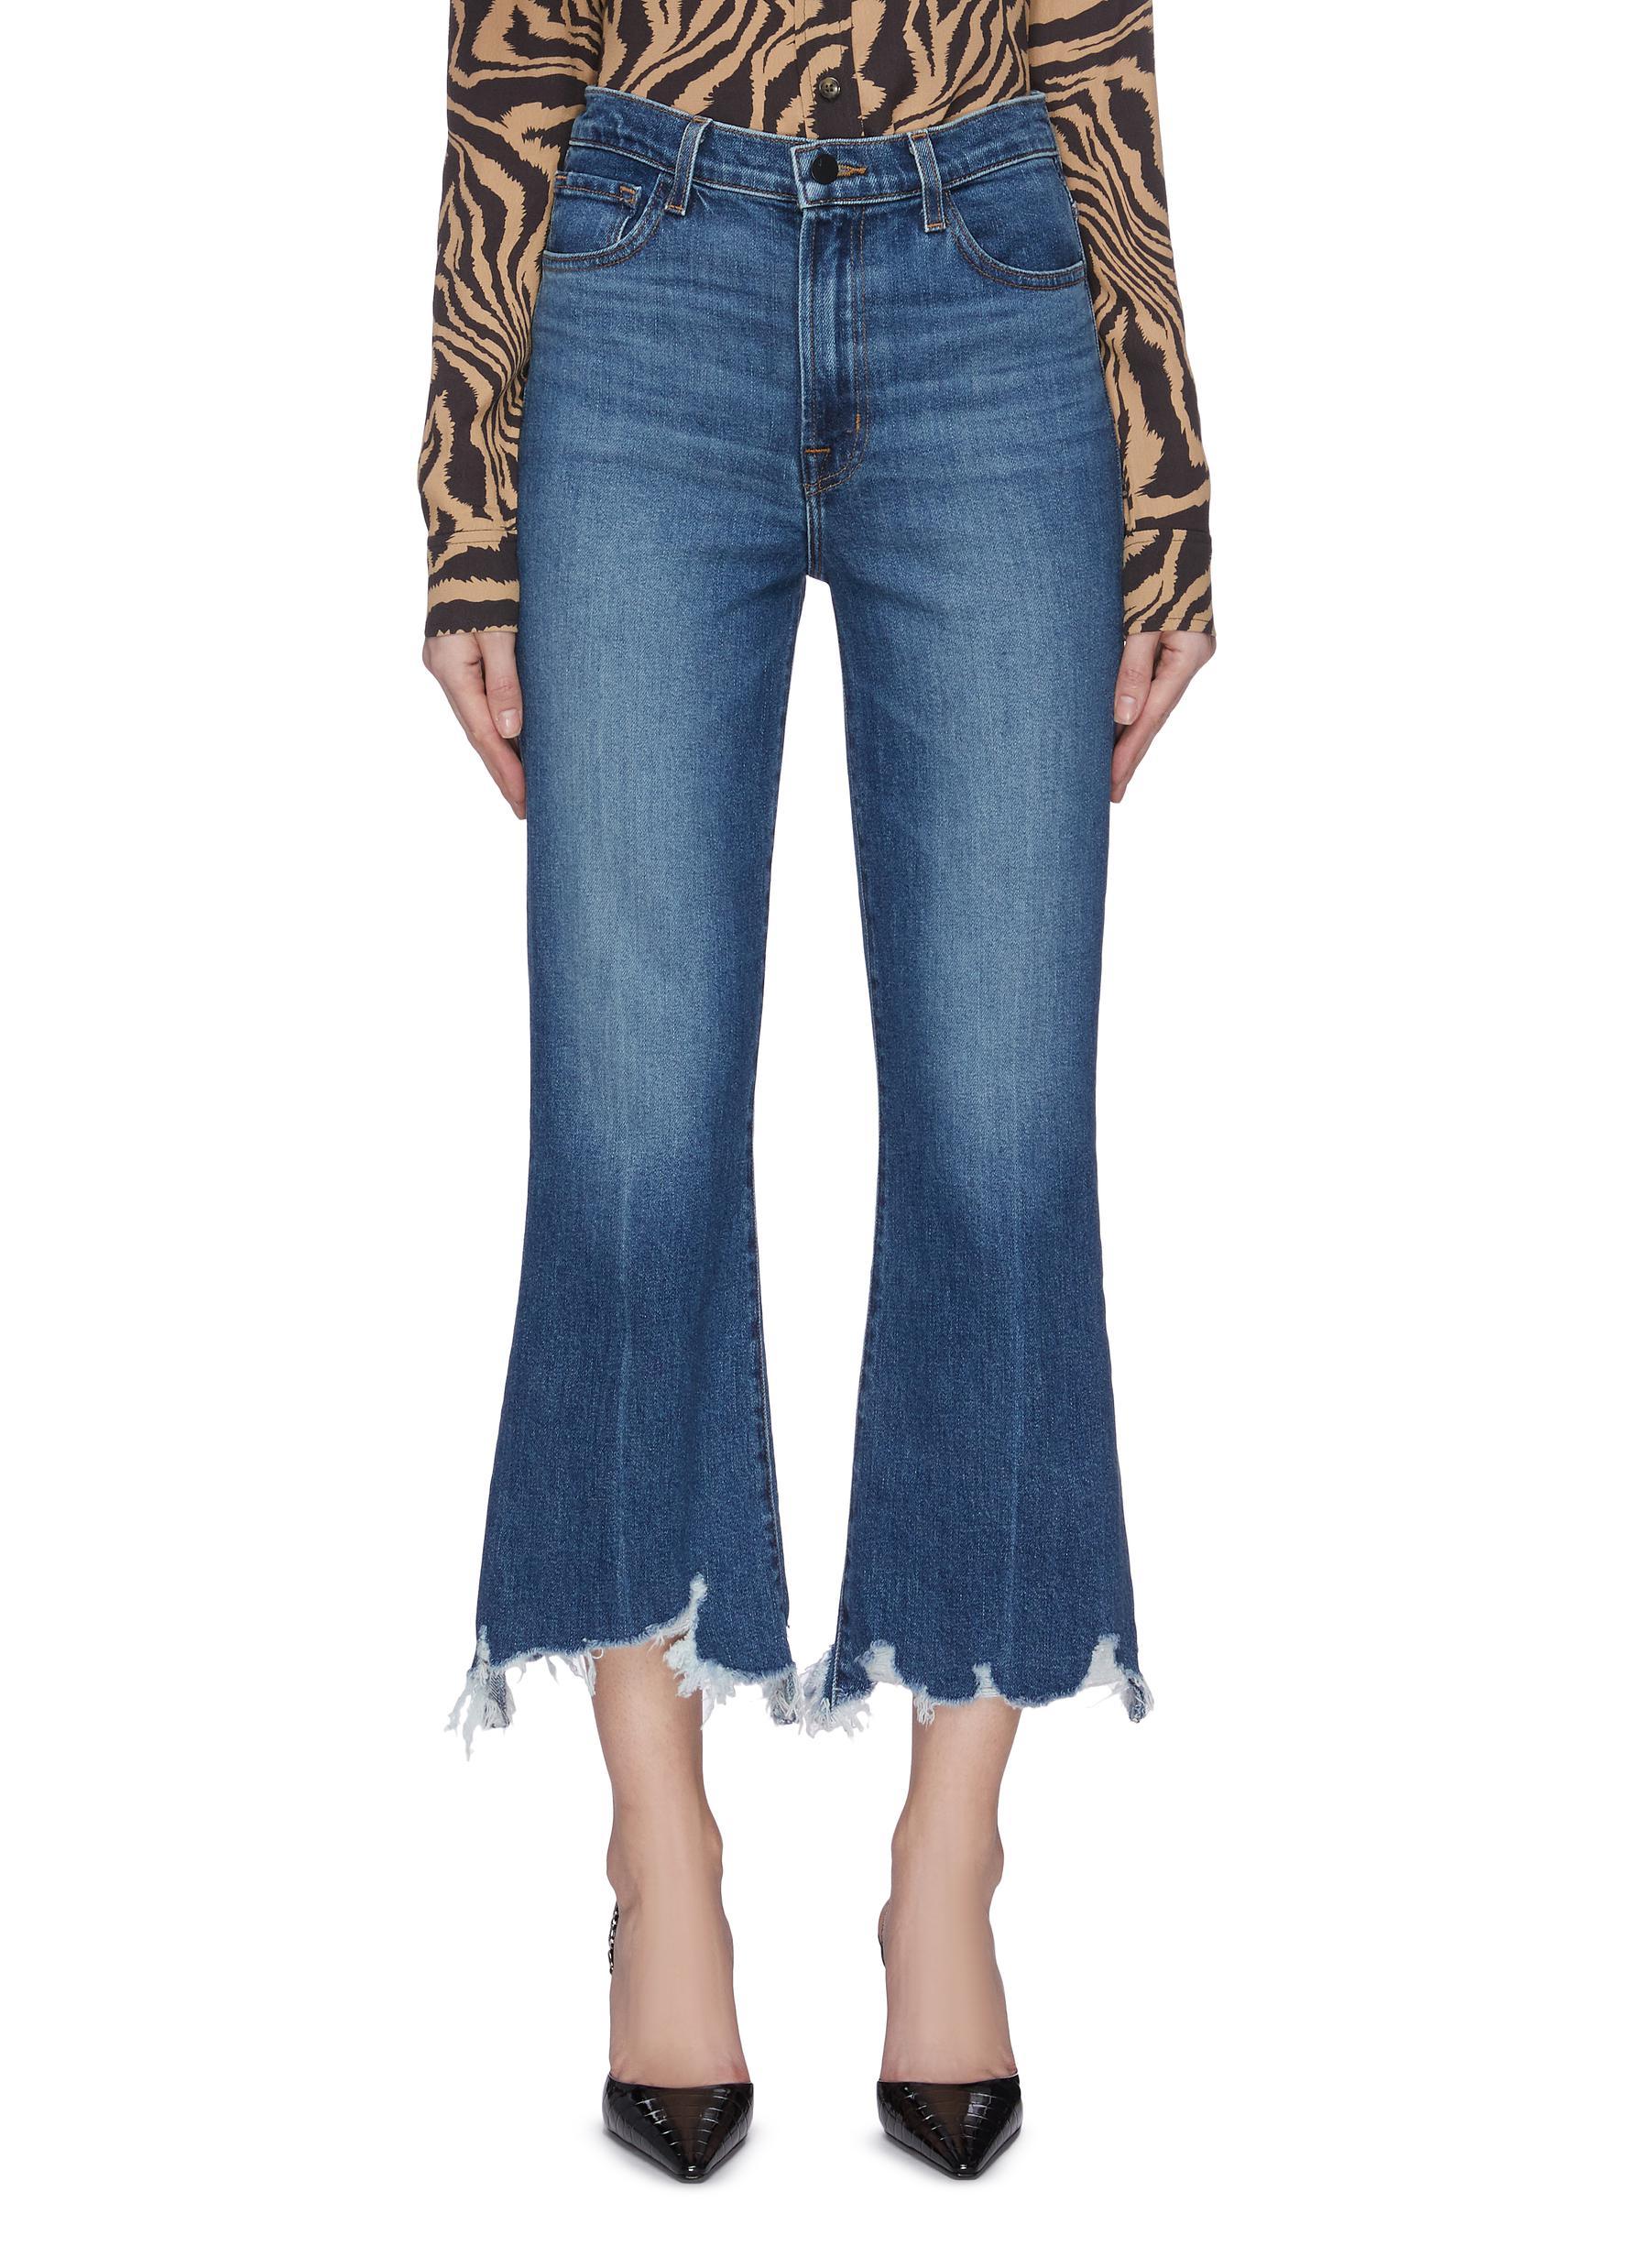 Buy J Brand Jeans 'Julia' whiskering frayed hem flare jeans